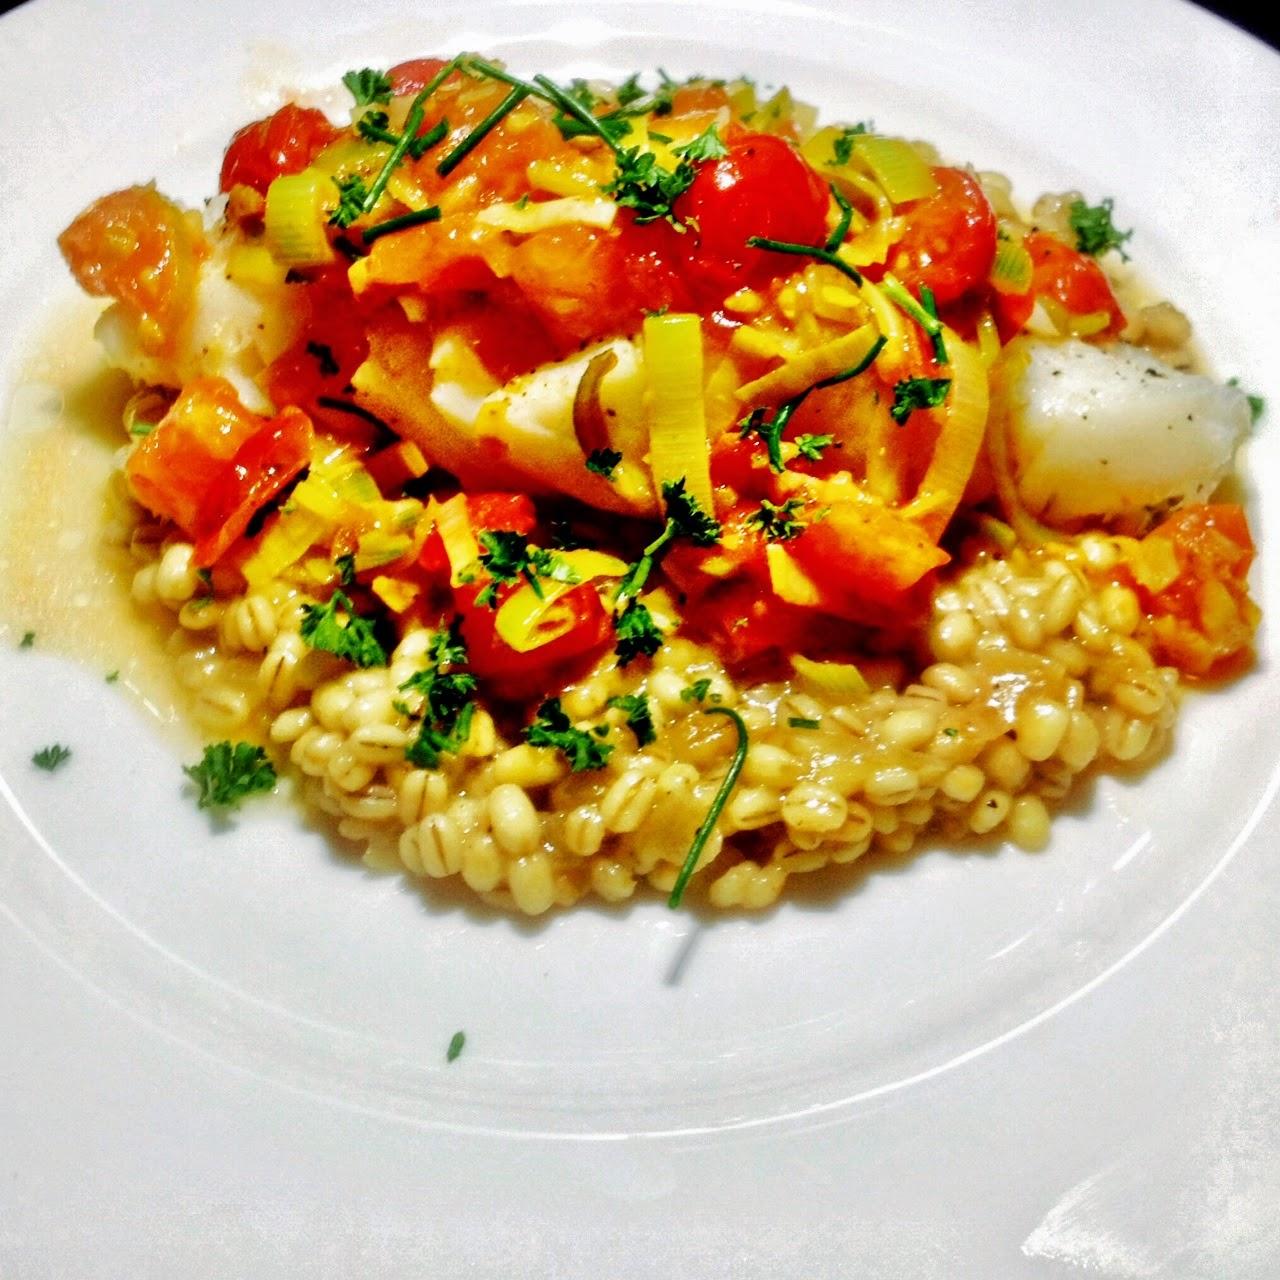 Salt-Baked Sea Bass With Tomato Vinaigrette Recipes — Dishmaps